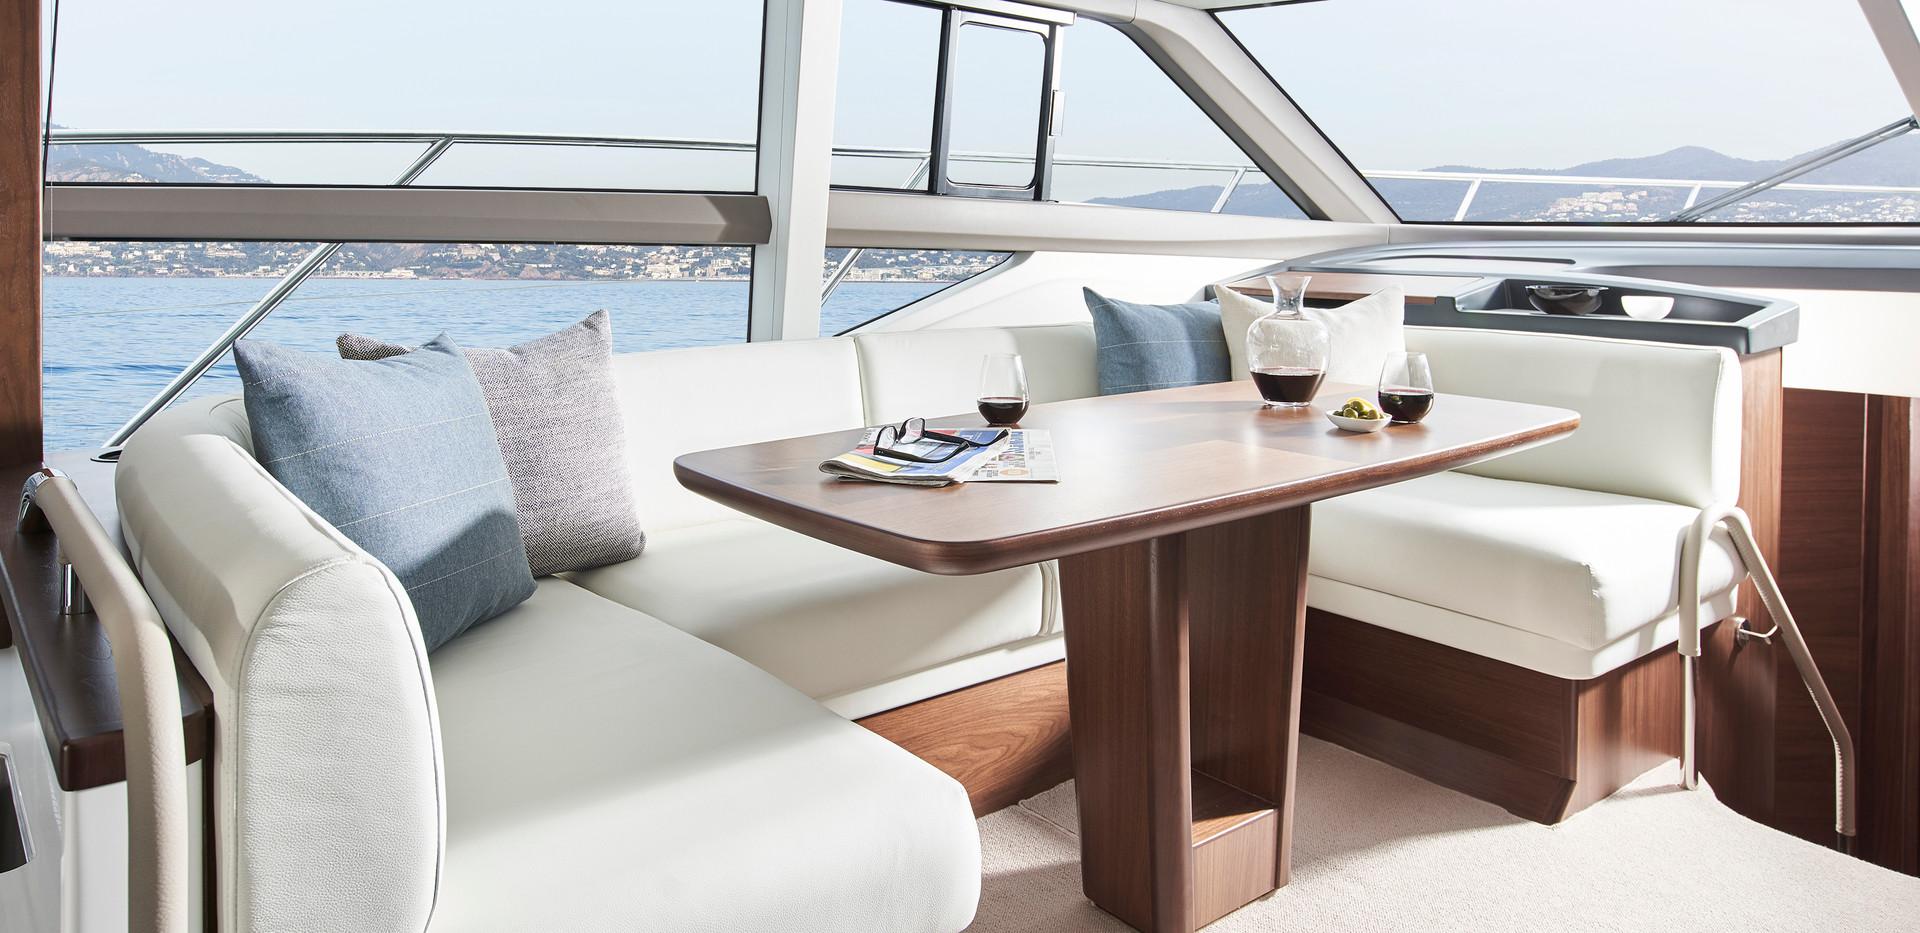 f50-interior-saloon-seating-walnut-satin